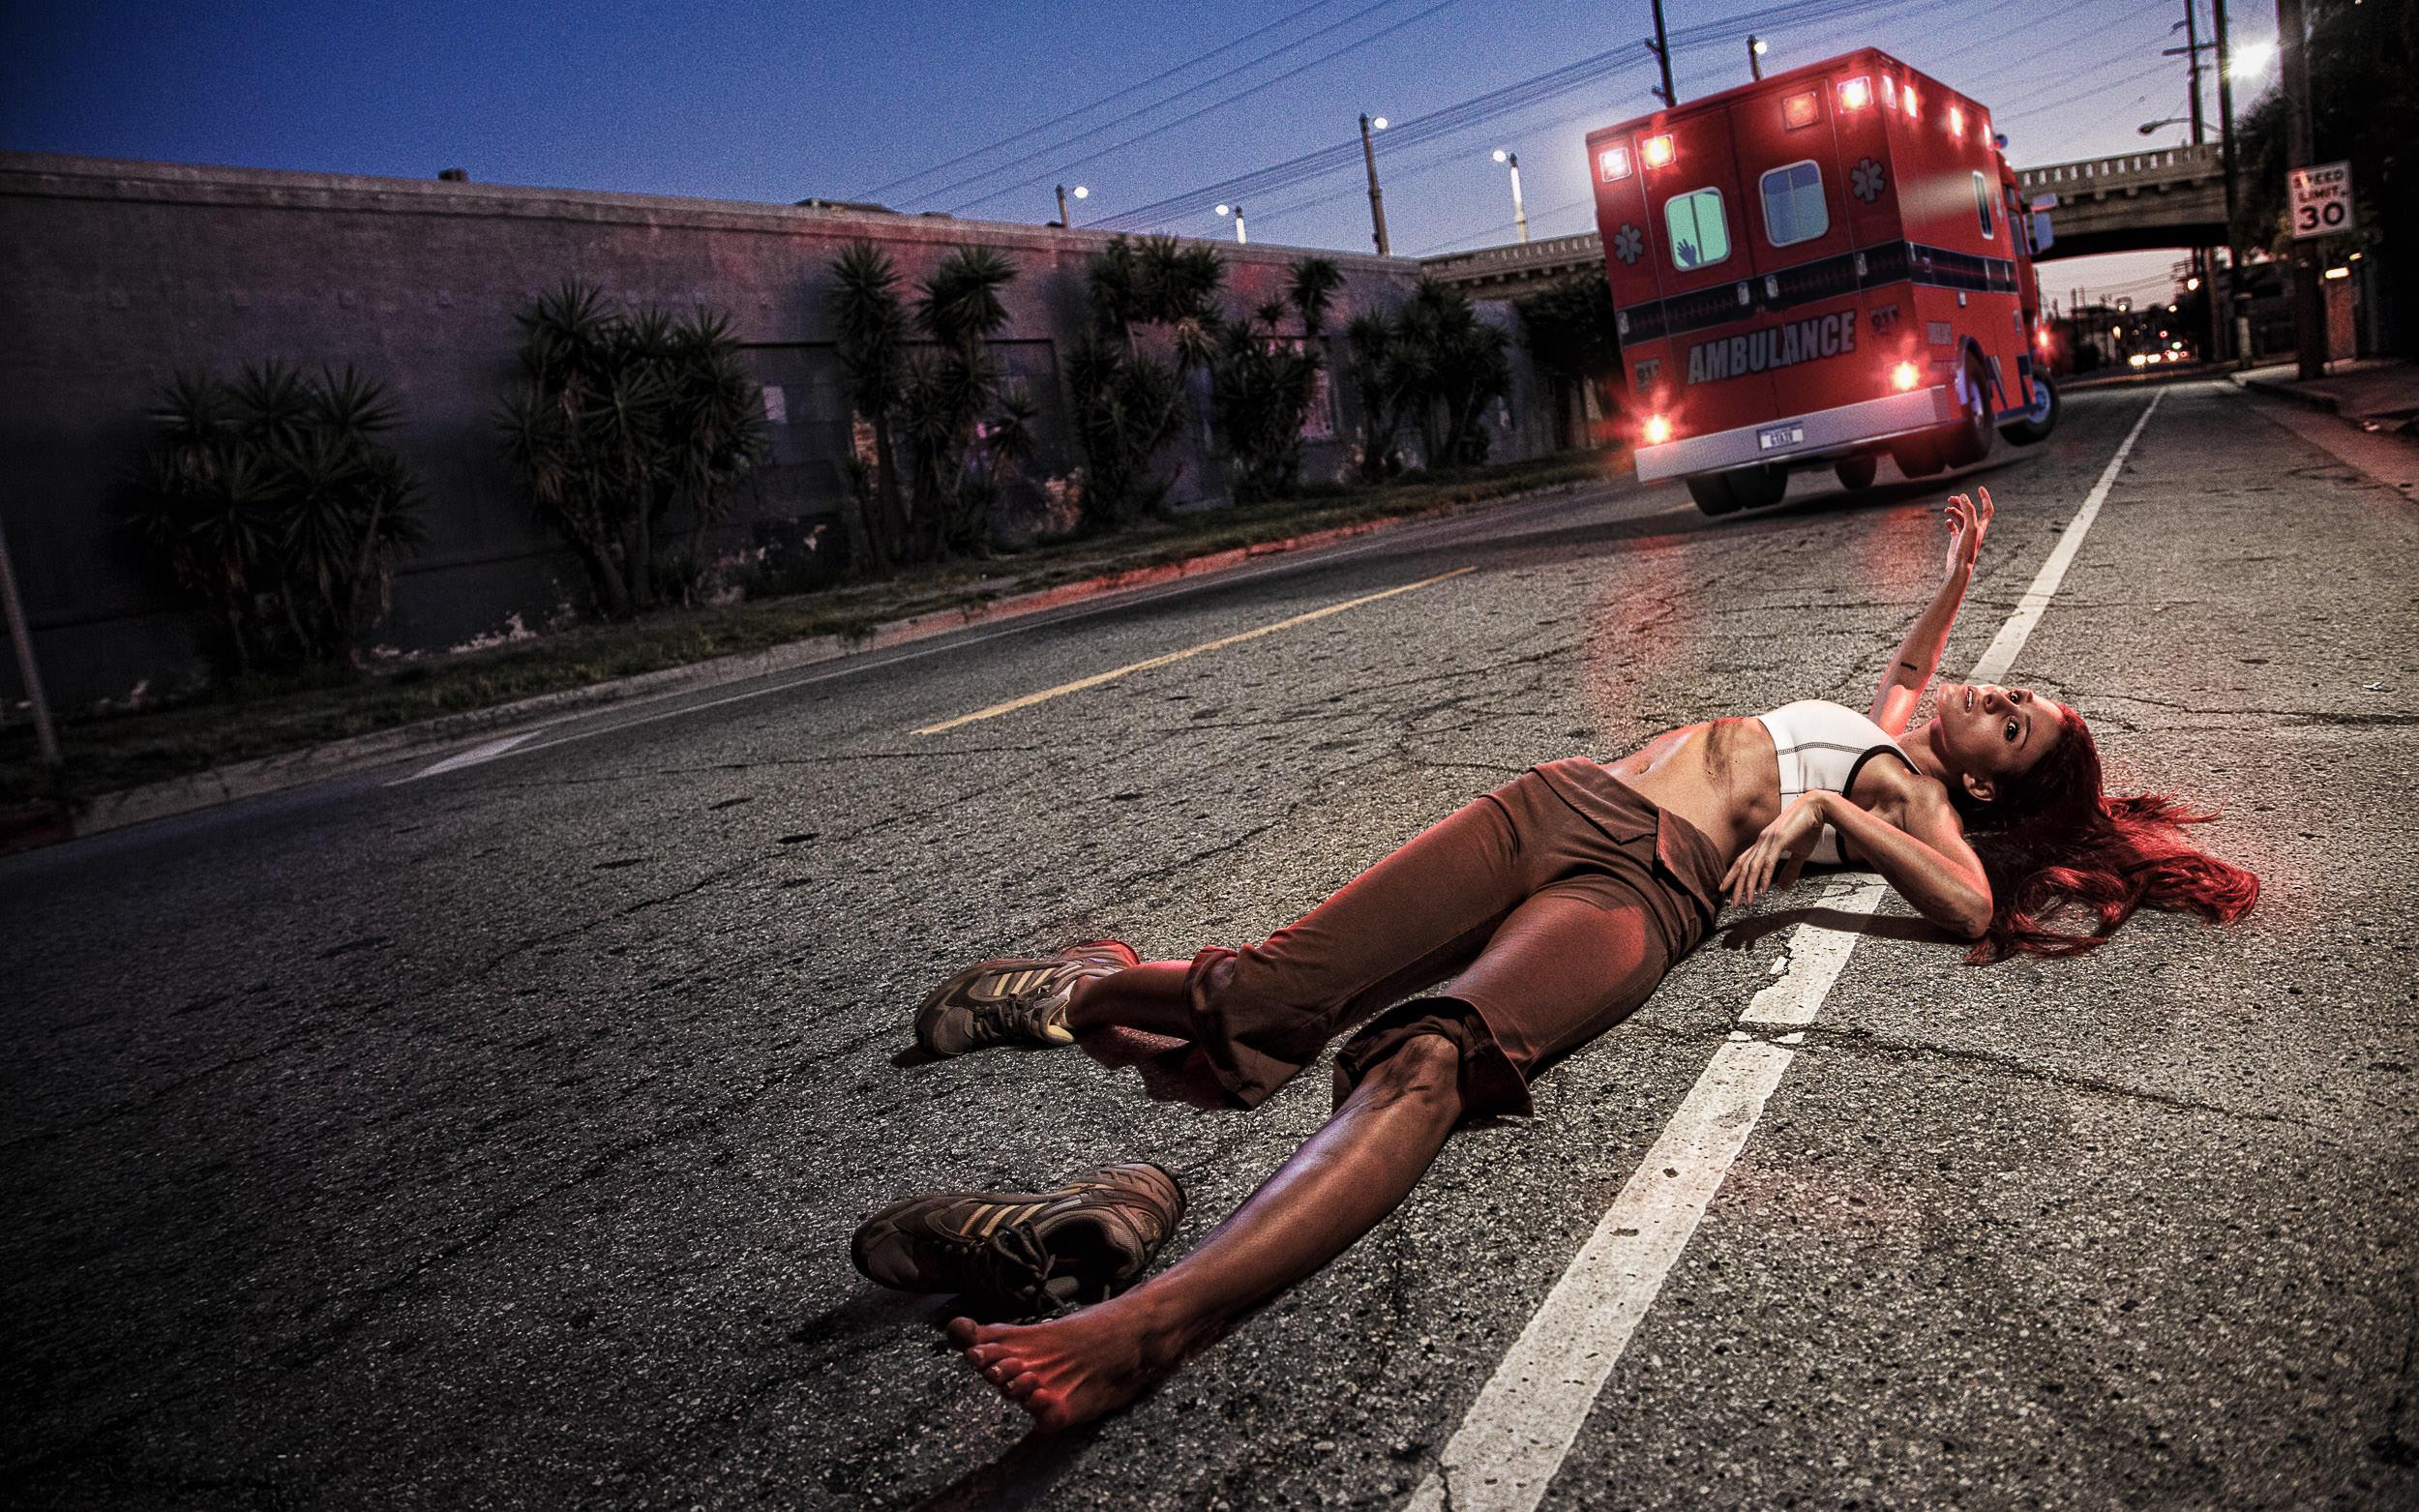 IRONIC DEATH #4 — HIT AND RUN BY AMBULANCE